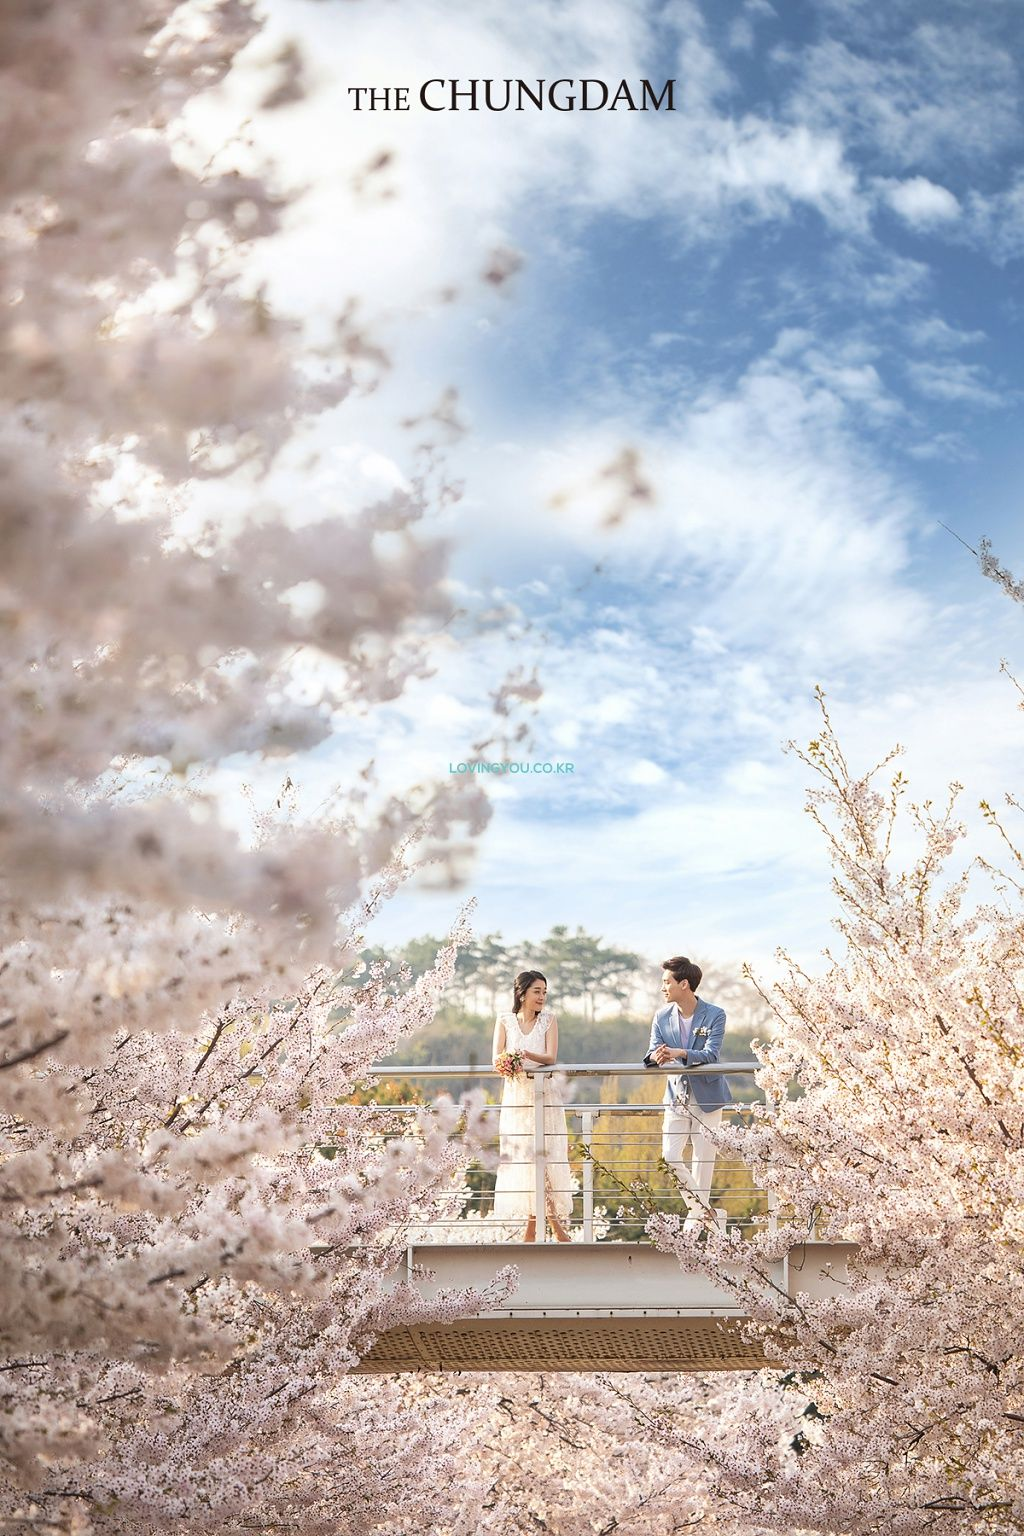 The Chungdam One Life One Love Korea Pre Wedding Photoshoot By Lovingyou Wedding Photoshoot Wedding Photography Pre Wedding Photoshoot